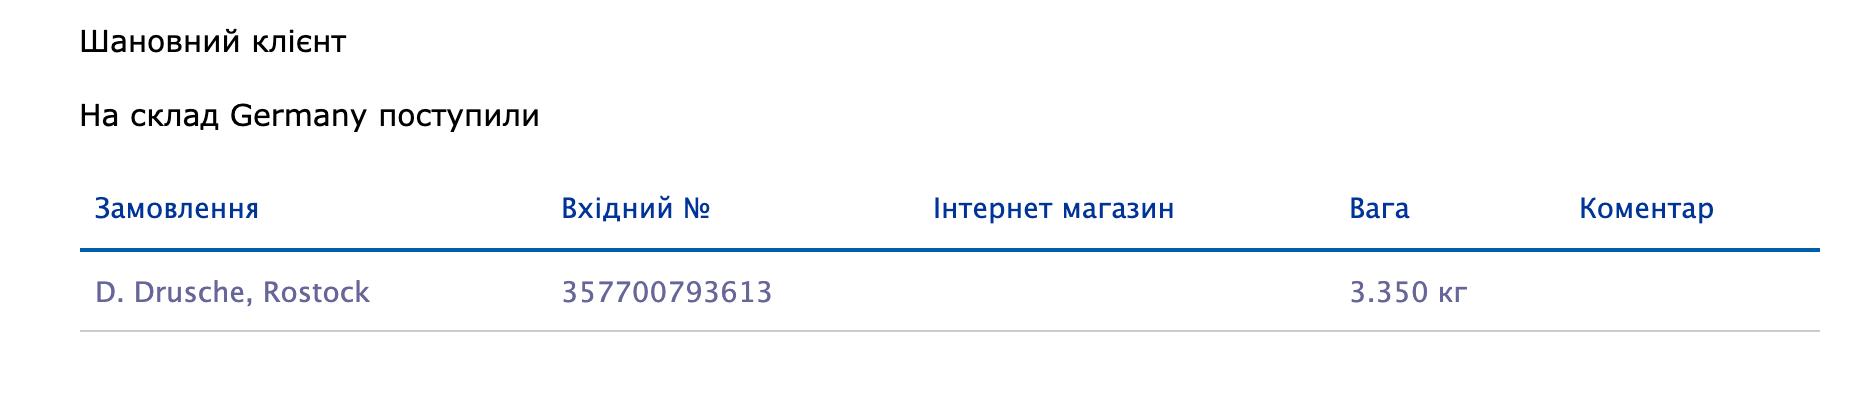 Снимок экрана 2020-04-27 в 22.04.18.